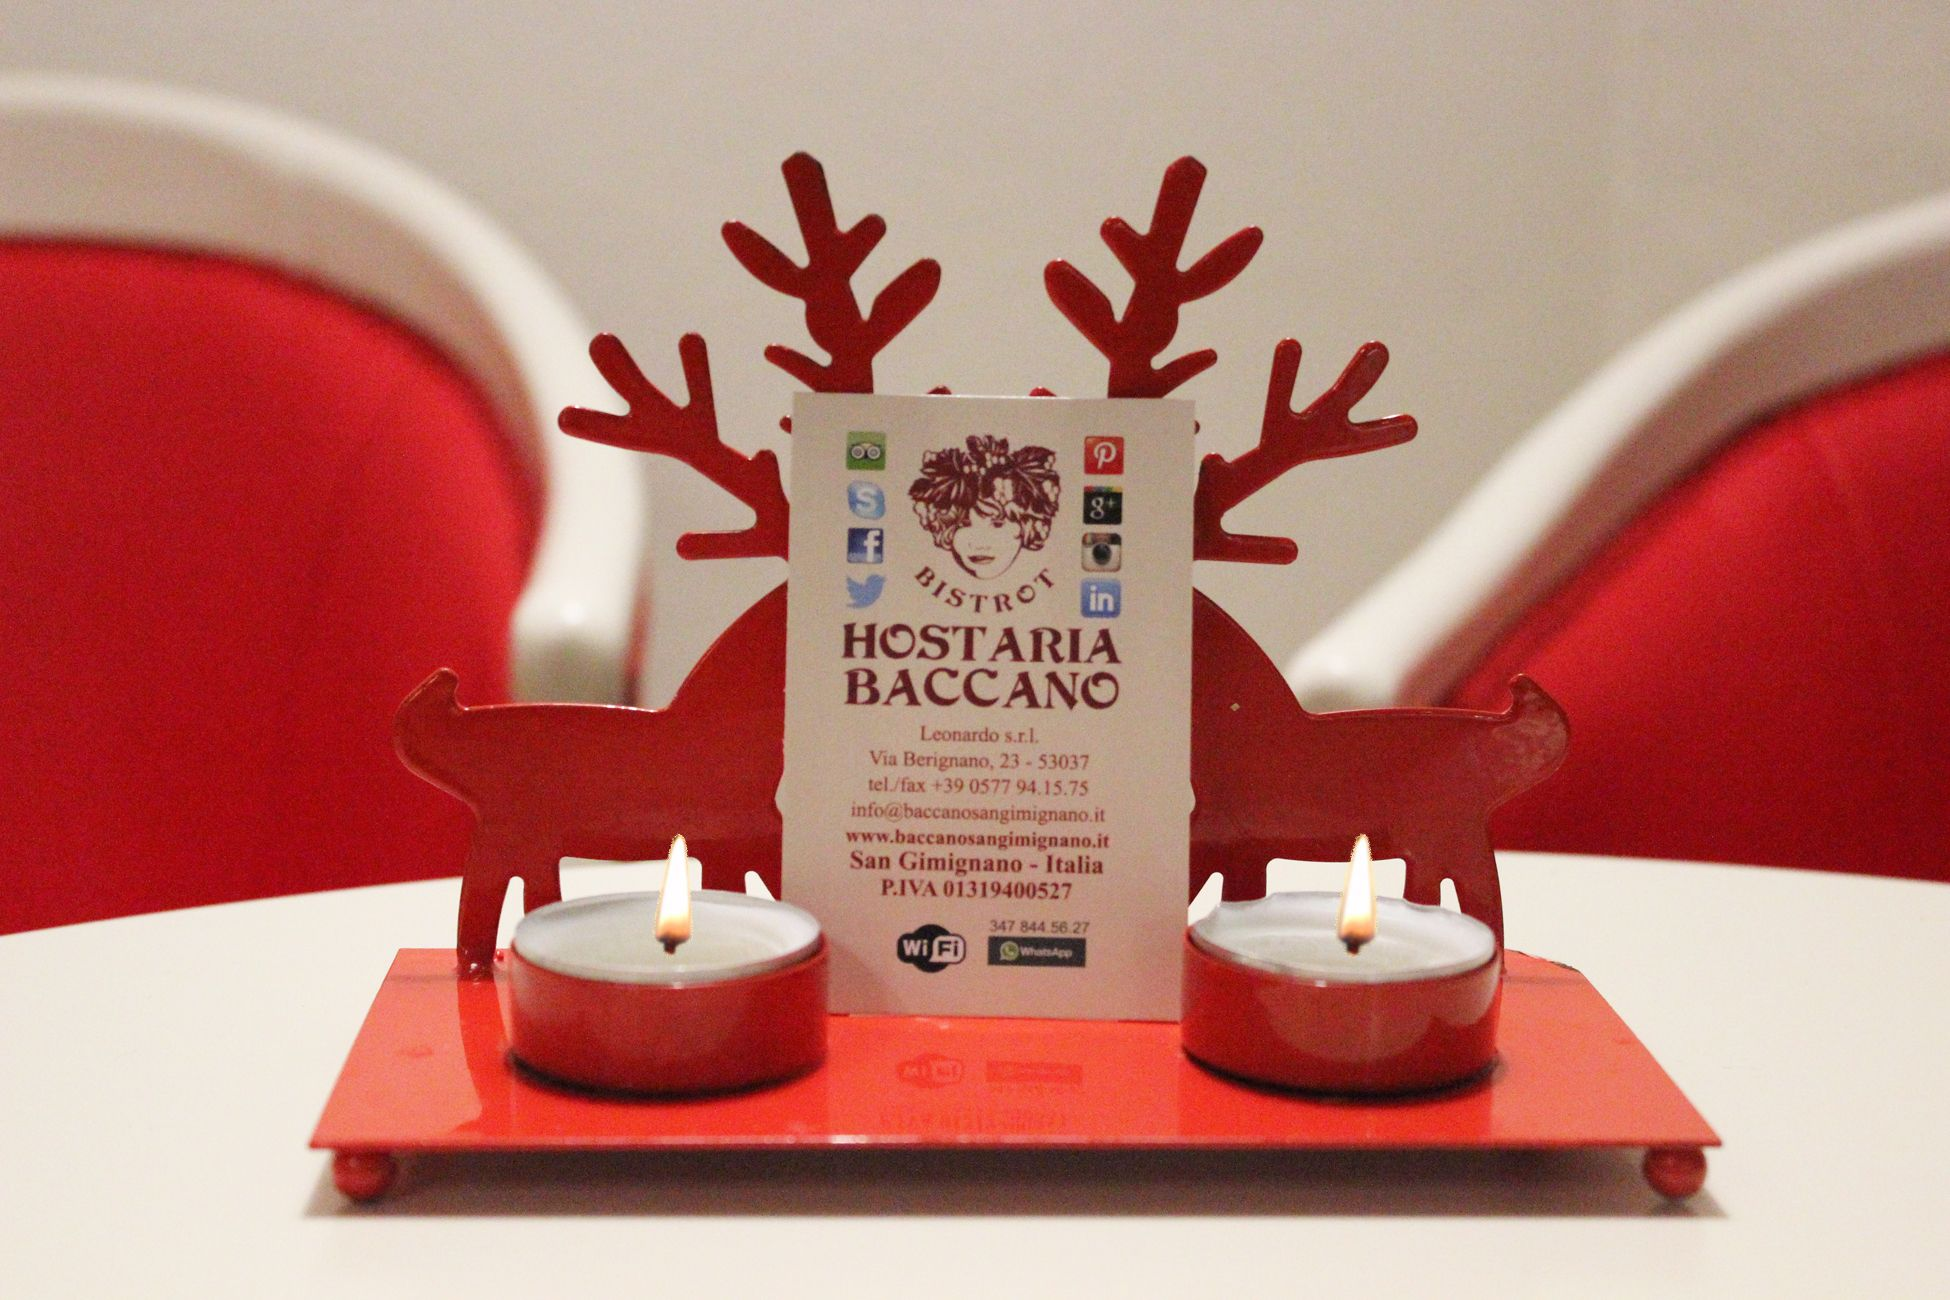 Baccano San Gimignano, Natale 2014 https://www.facebook.com/baccano.san.gimignano/photos/a.763105387078635.1073741840.756028791119628/764348350287672/?type=1&theater … #sangimignano